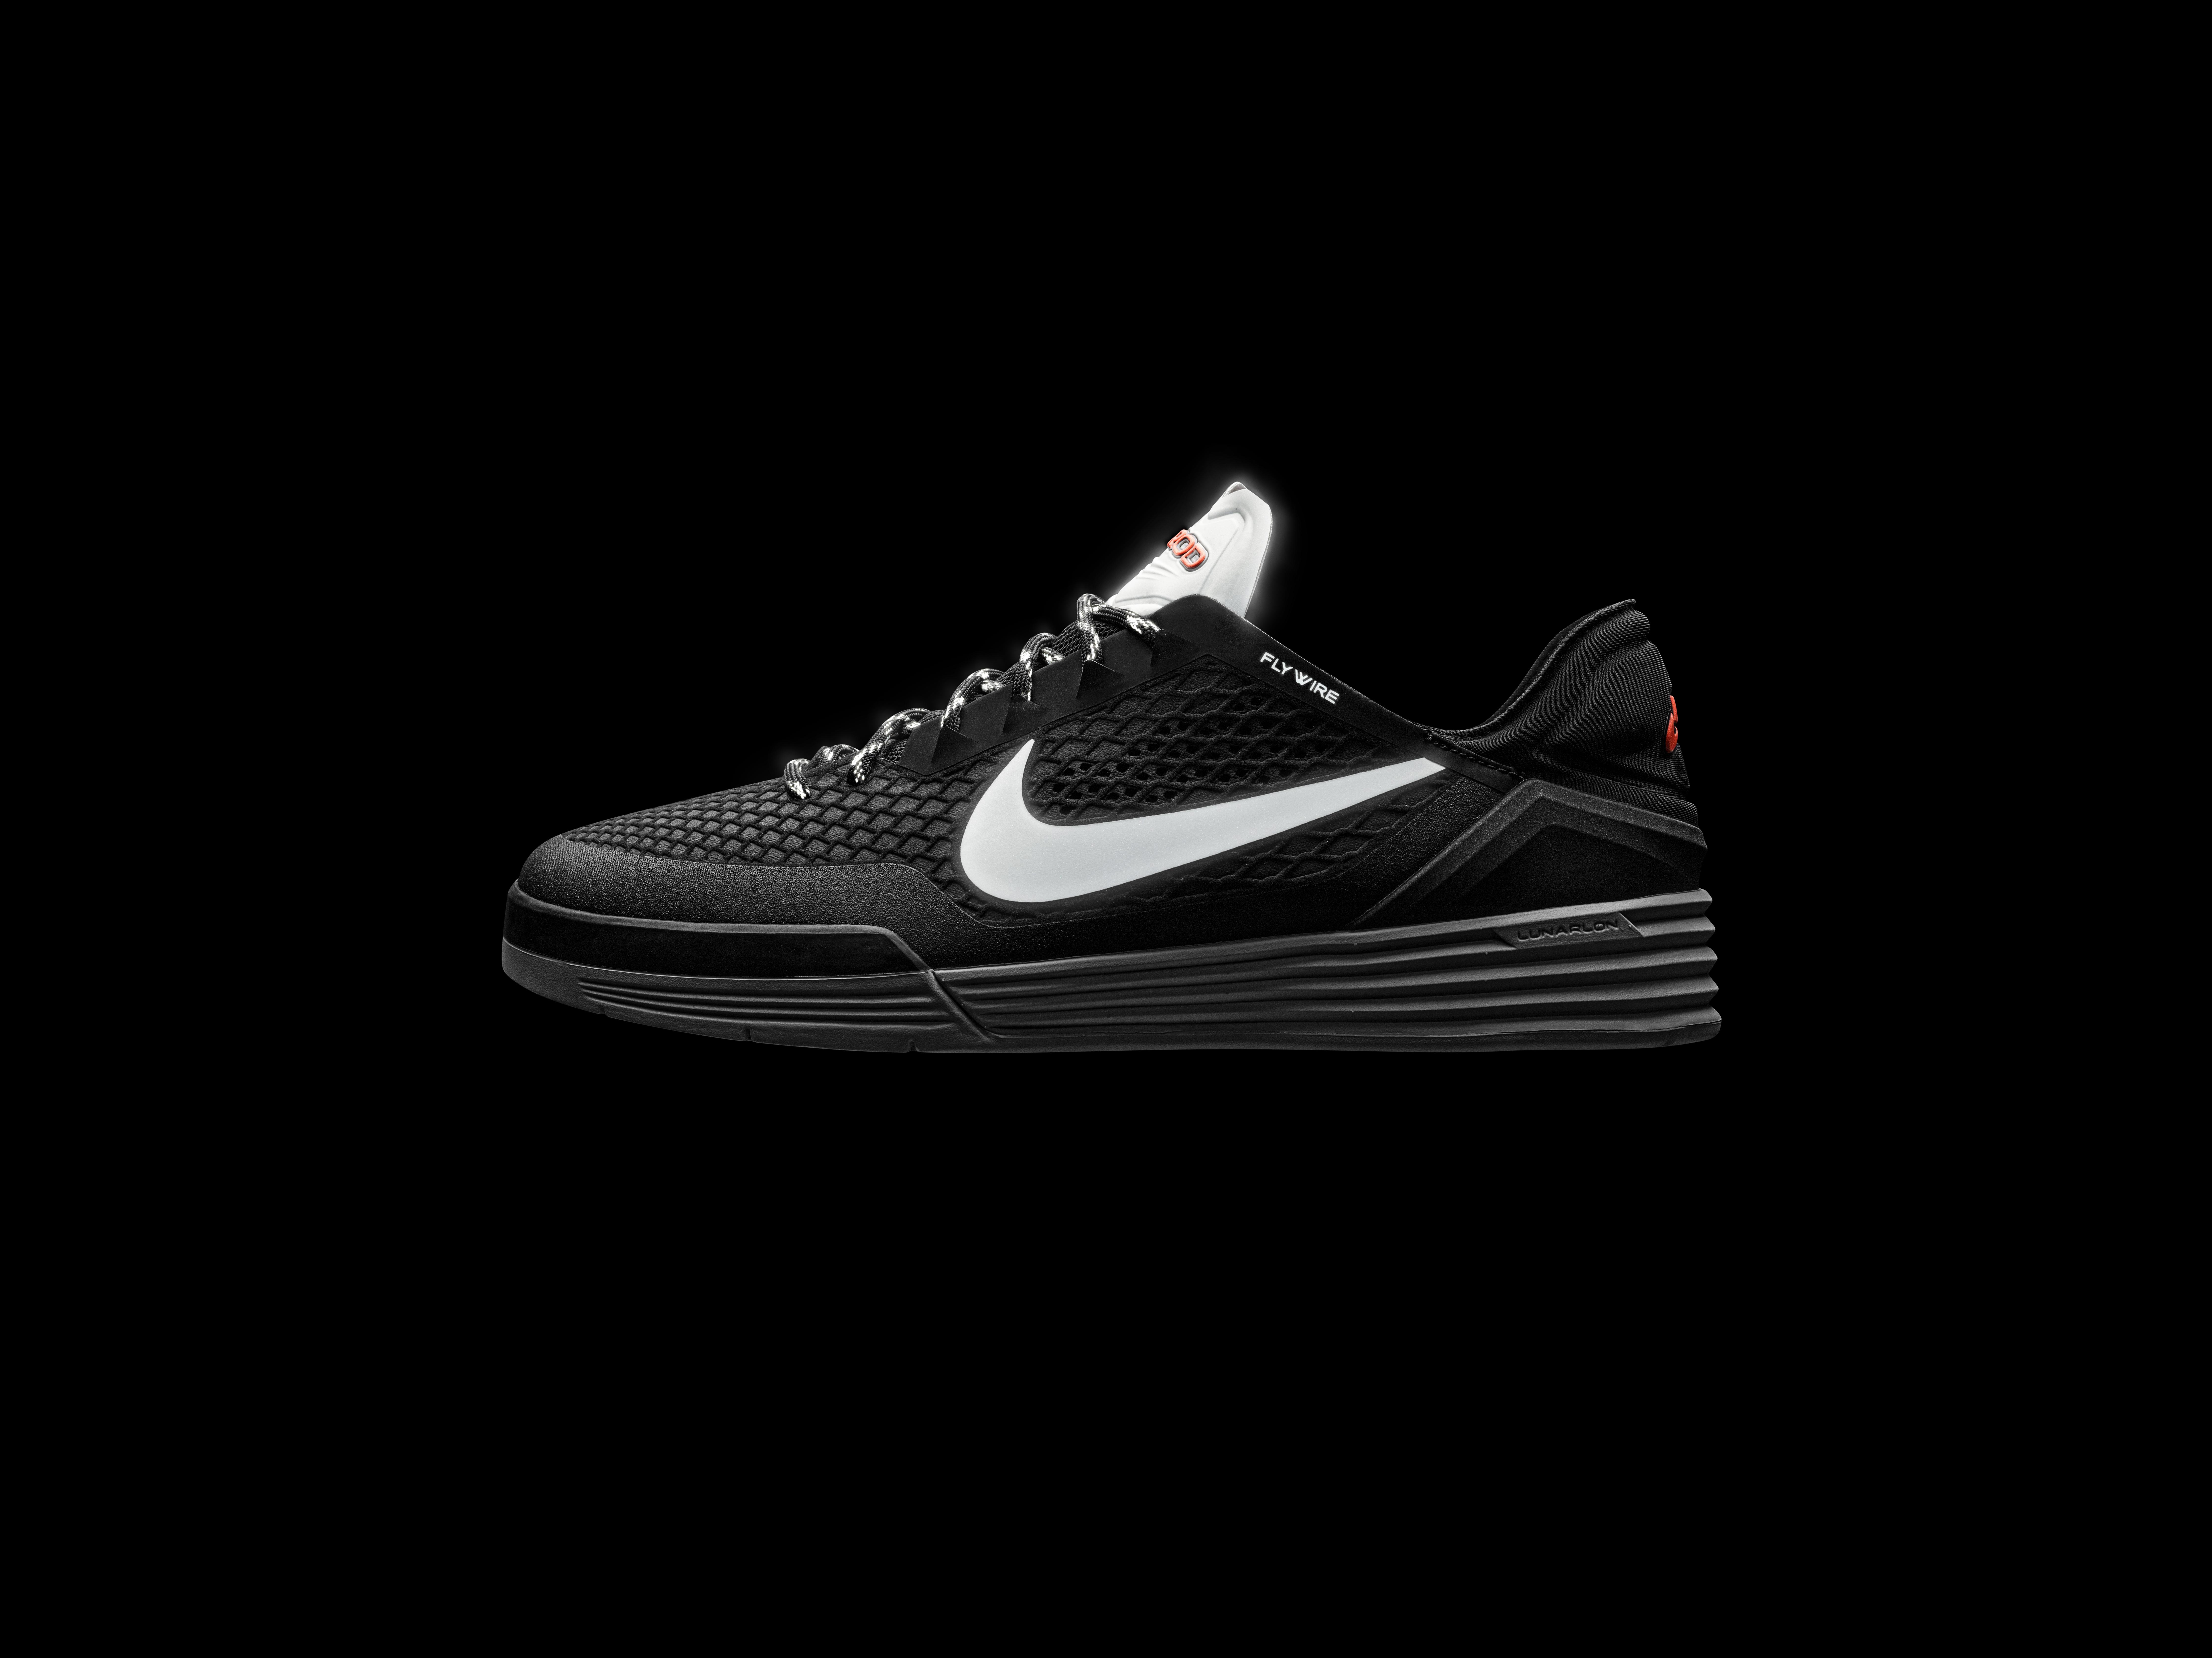 Nike Sb Flash Pack Free Shipping Online Shopping Clothes  02c422e3b